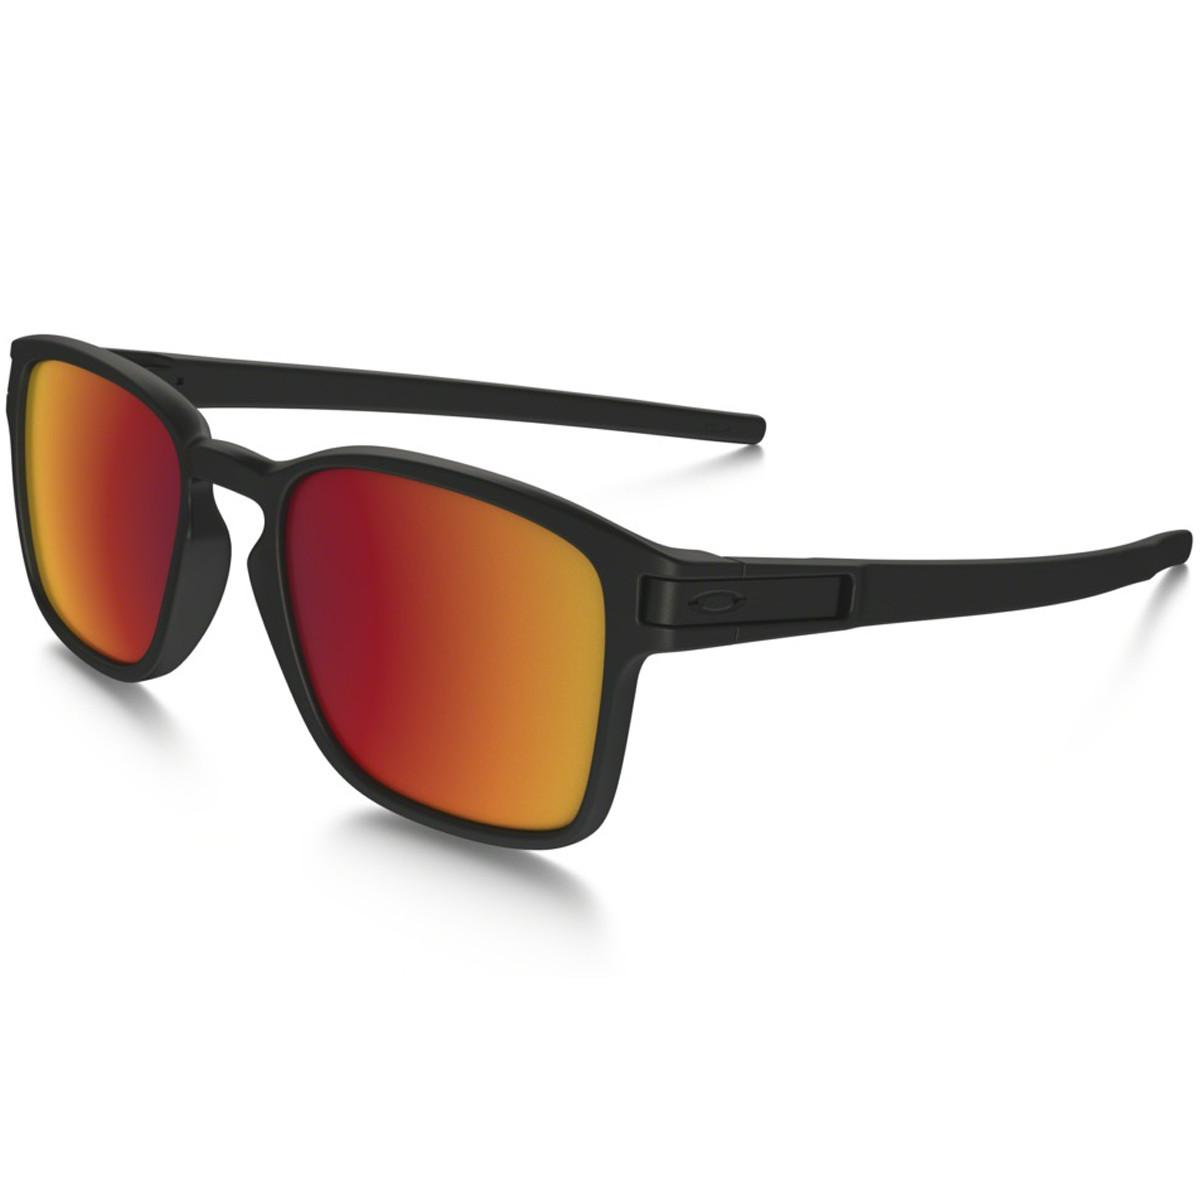 461bbf09dc92b Óculos Oakley Latch Square Matte Black Lente Torch Iridium ref OO9353-03